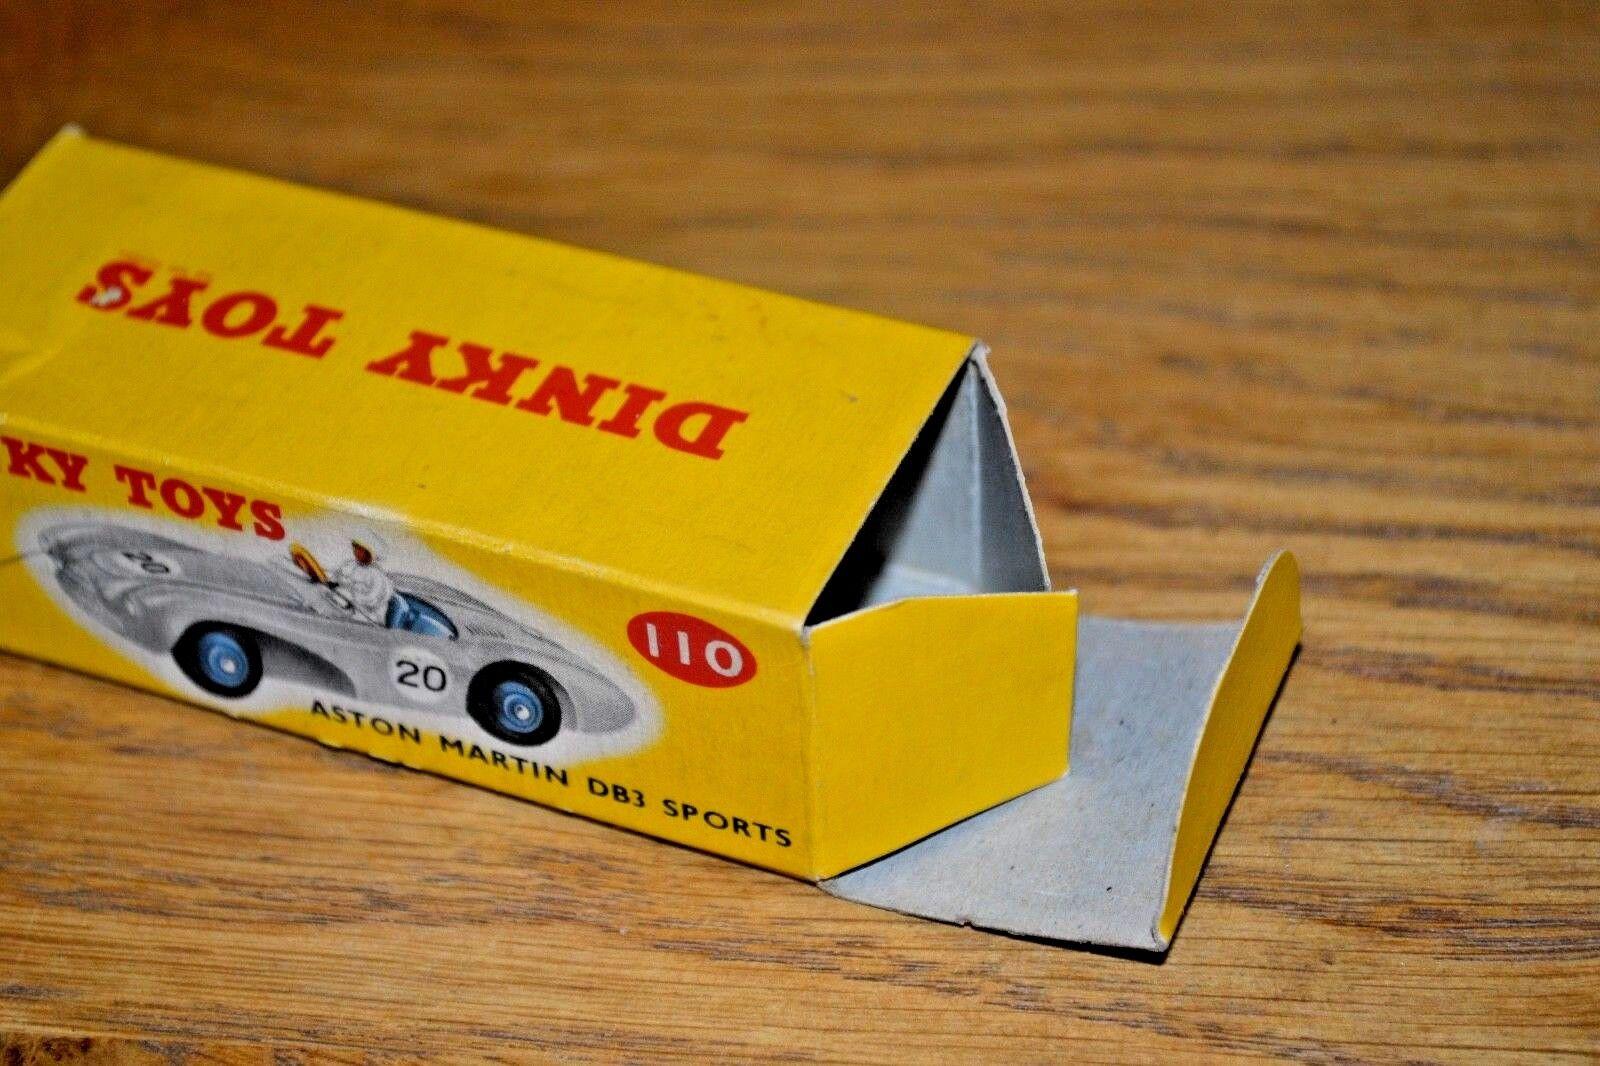 Dinky Toys Nº 110 Aston Martin DB3 DB3 DB3 coche deportivo; original Caja de color correcto f1f095